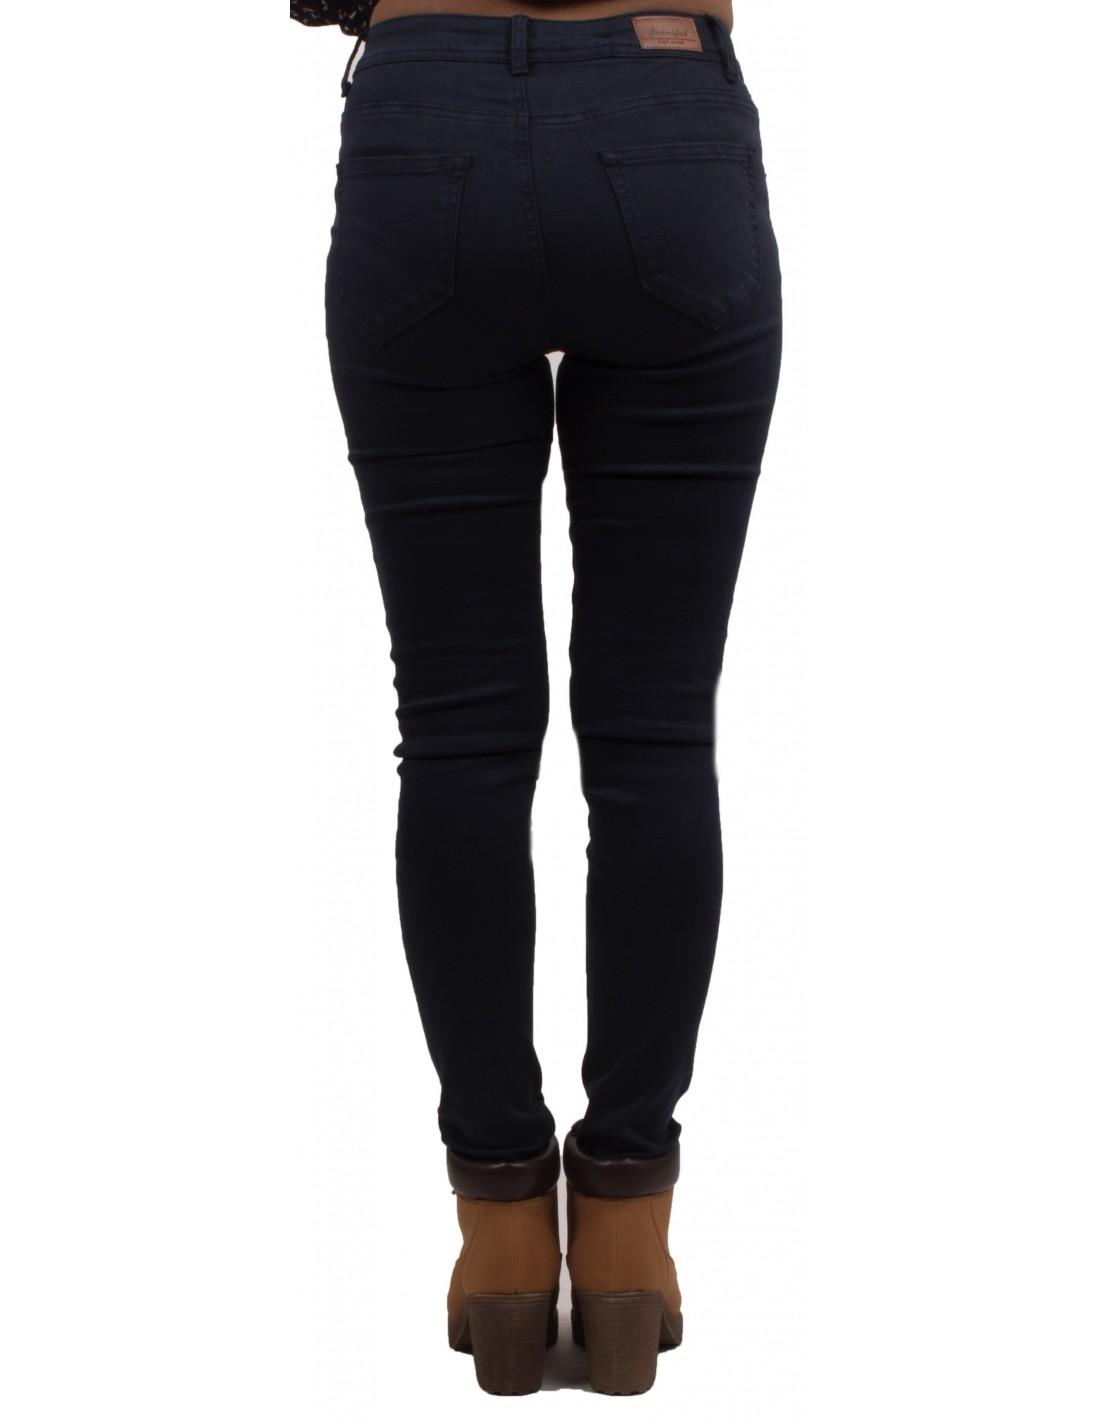 jean skinny bleu marine taille haute ultra stretch pour femme. Black Bedroom Furniture Sets. Home Design Ideas